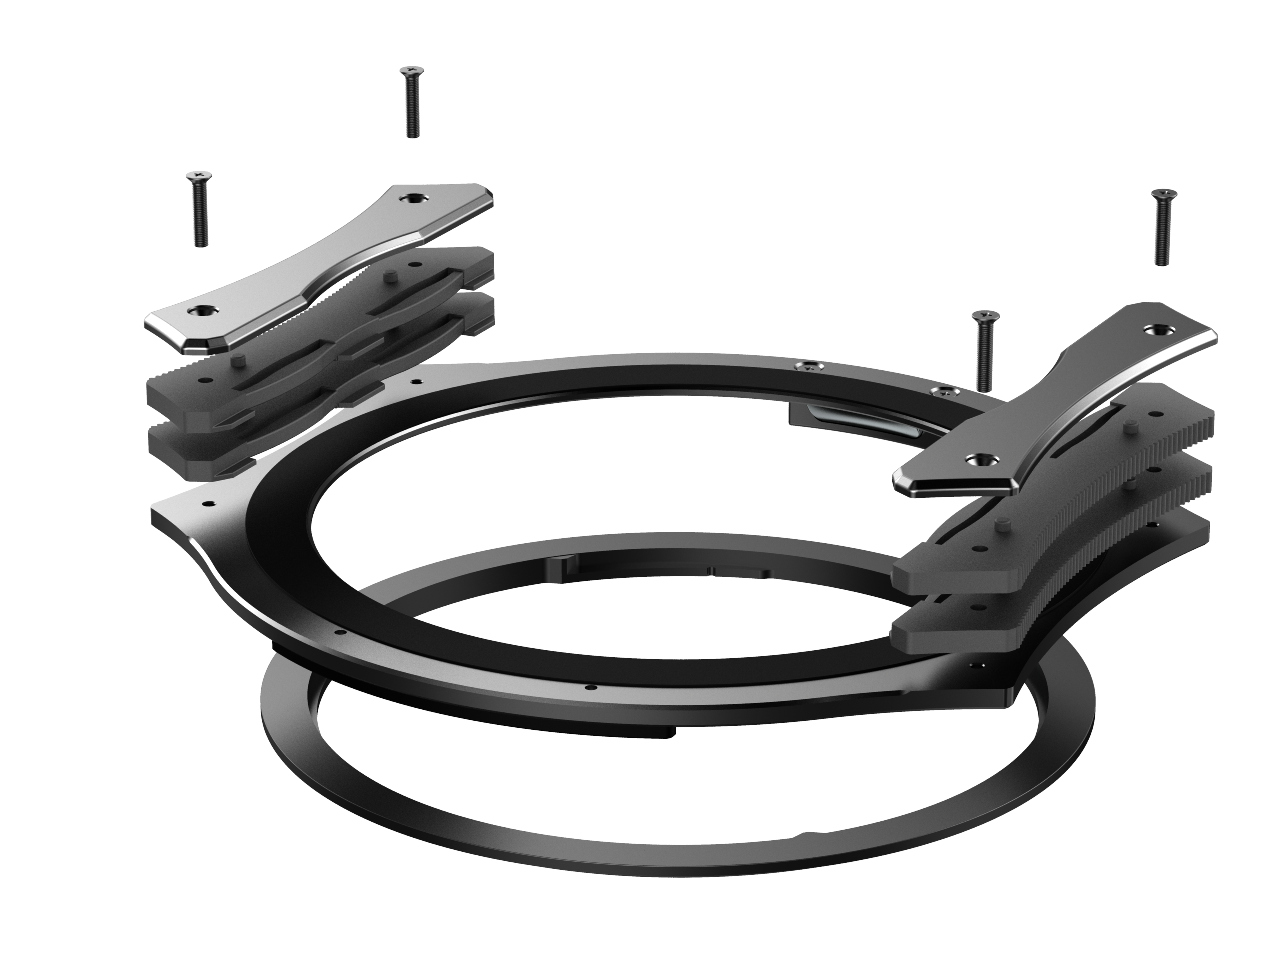 Irix_Edge_100 System parts